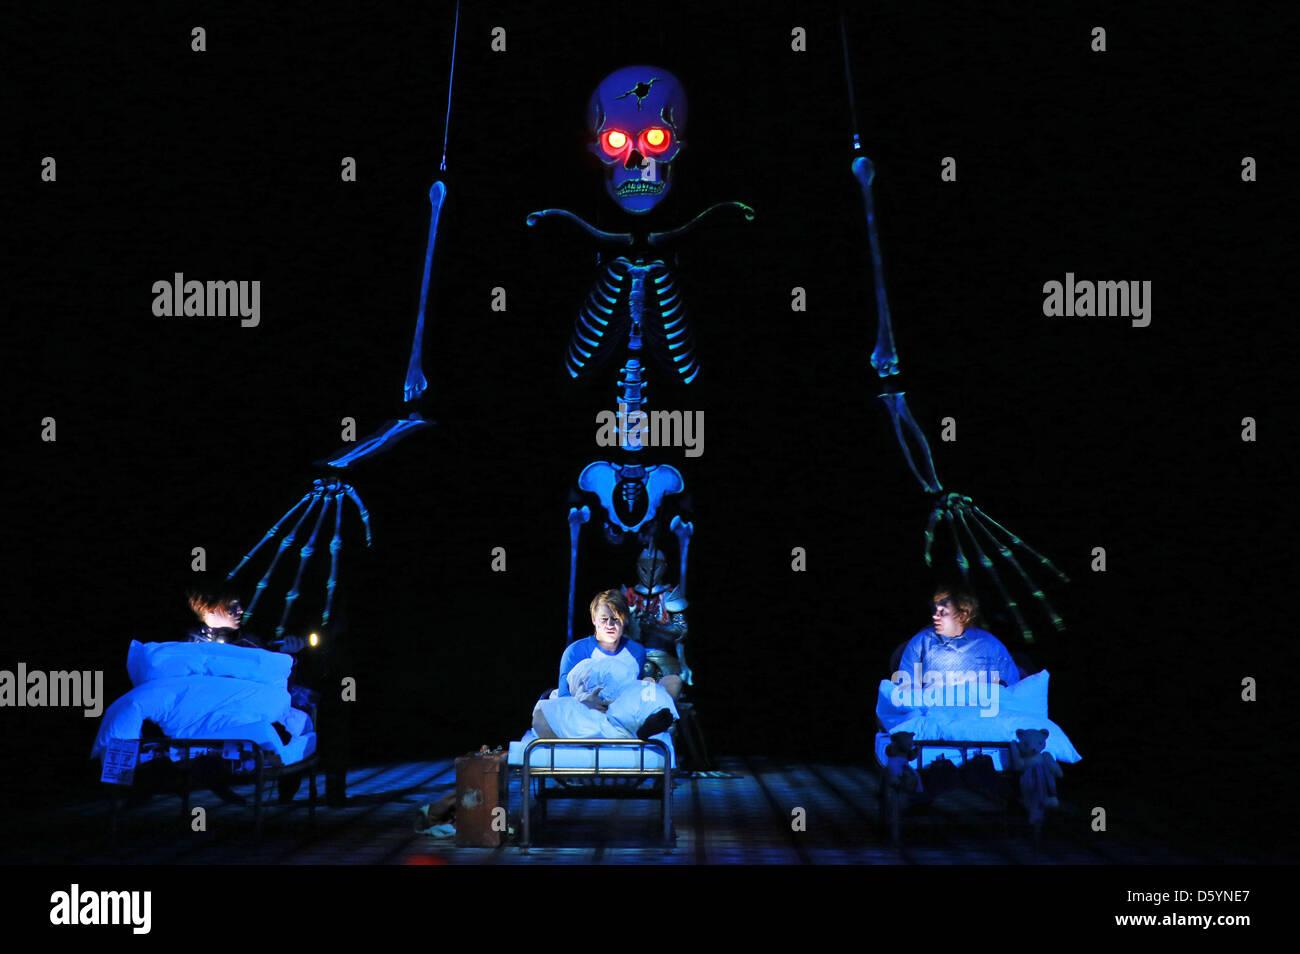 Julian Greis as Stuart Crenshaw (L-R), Sven Schelker as Jon Whitcroft and Heiko Raulin as Hubert de Burgh rehearse - Stock Image